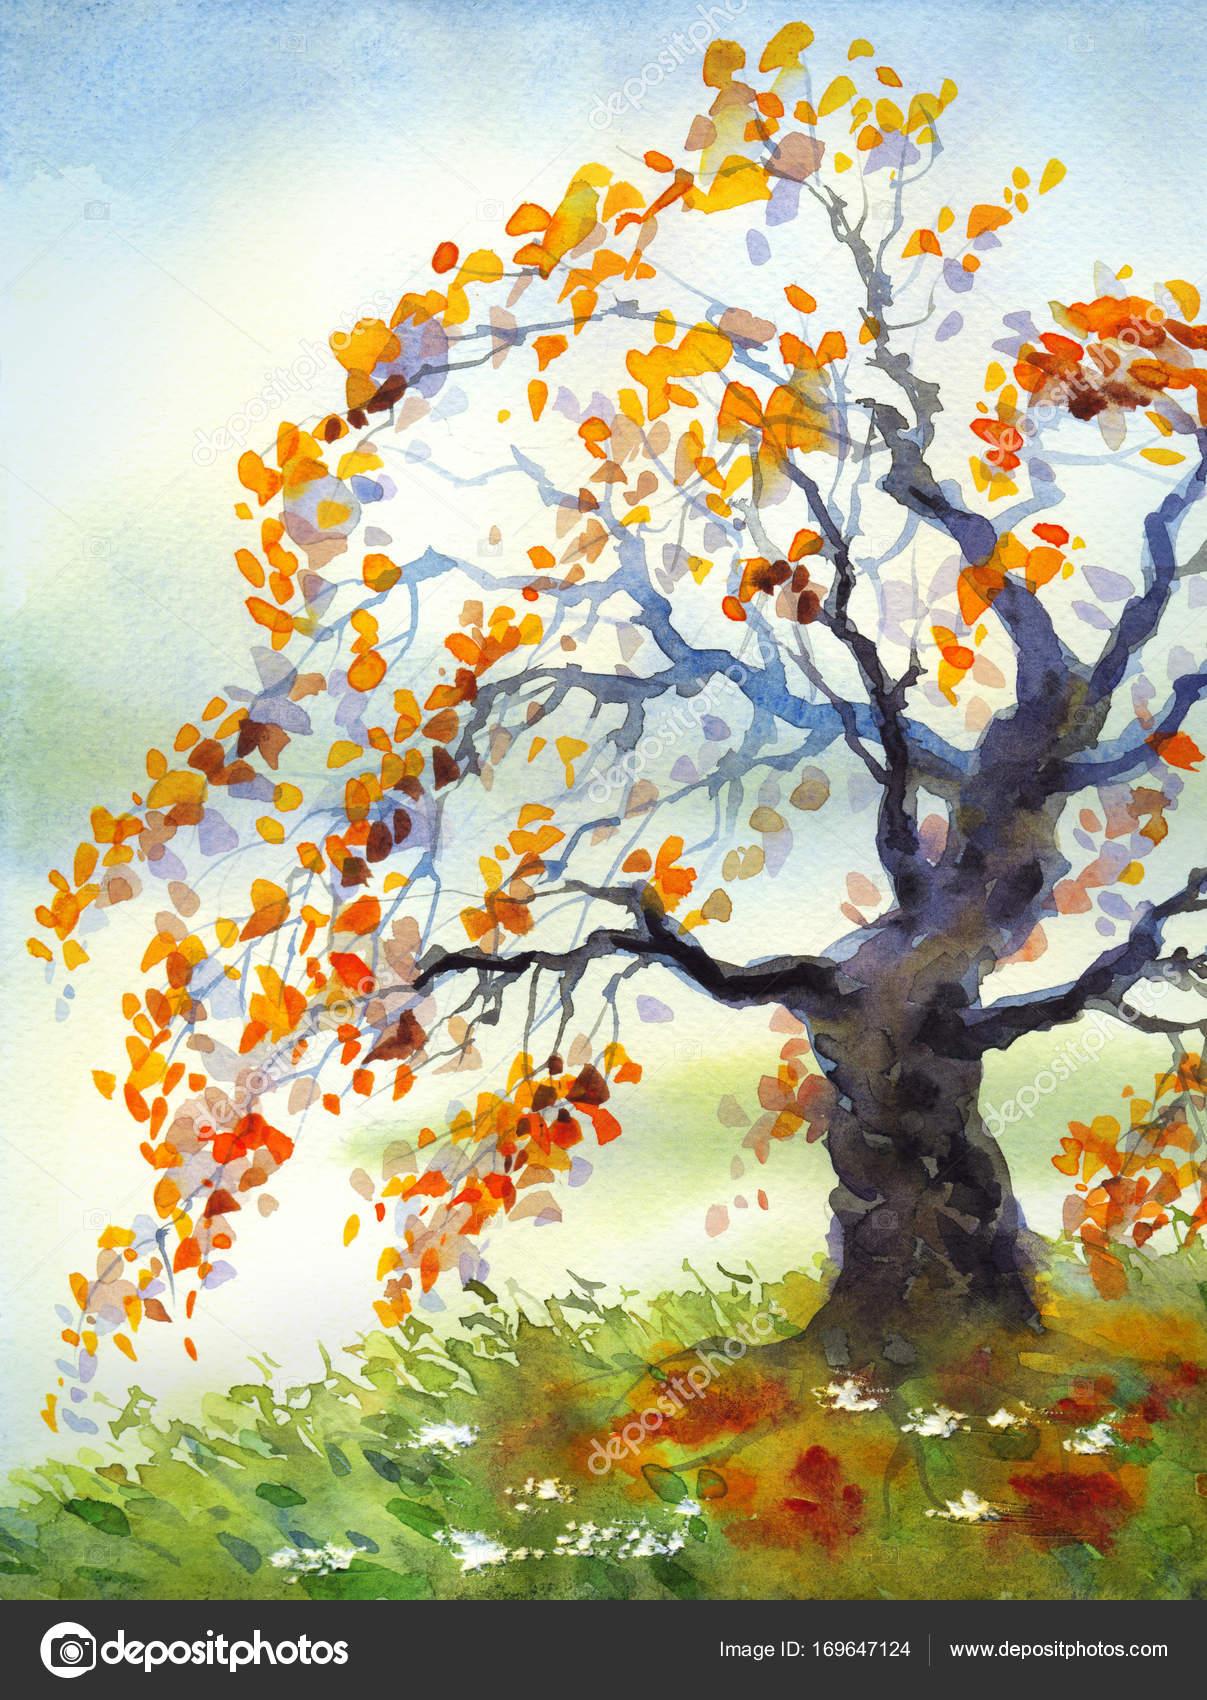 Aquarell Landschaft Herbst Baum In Truben Tag Stockfoto C Marinka